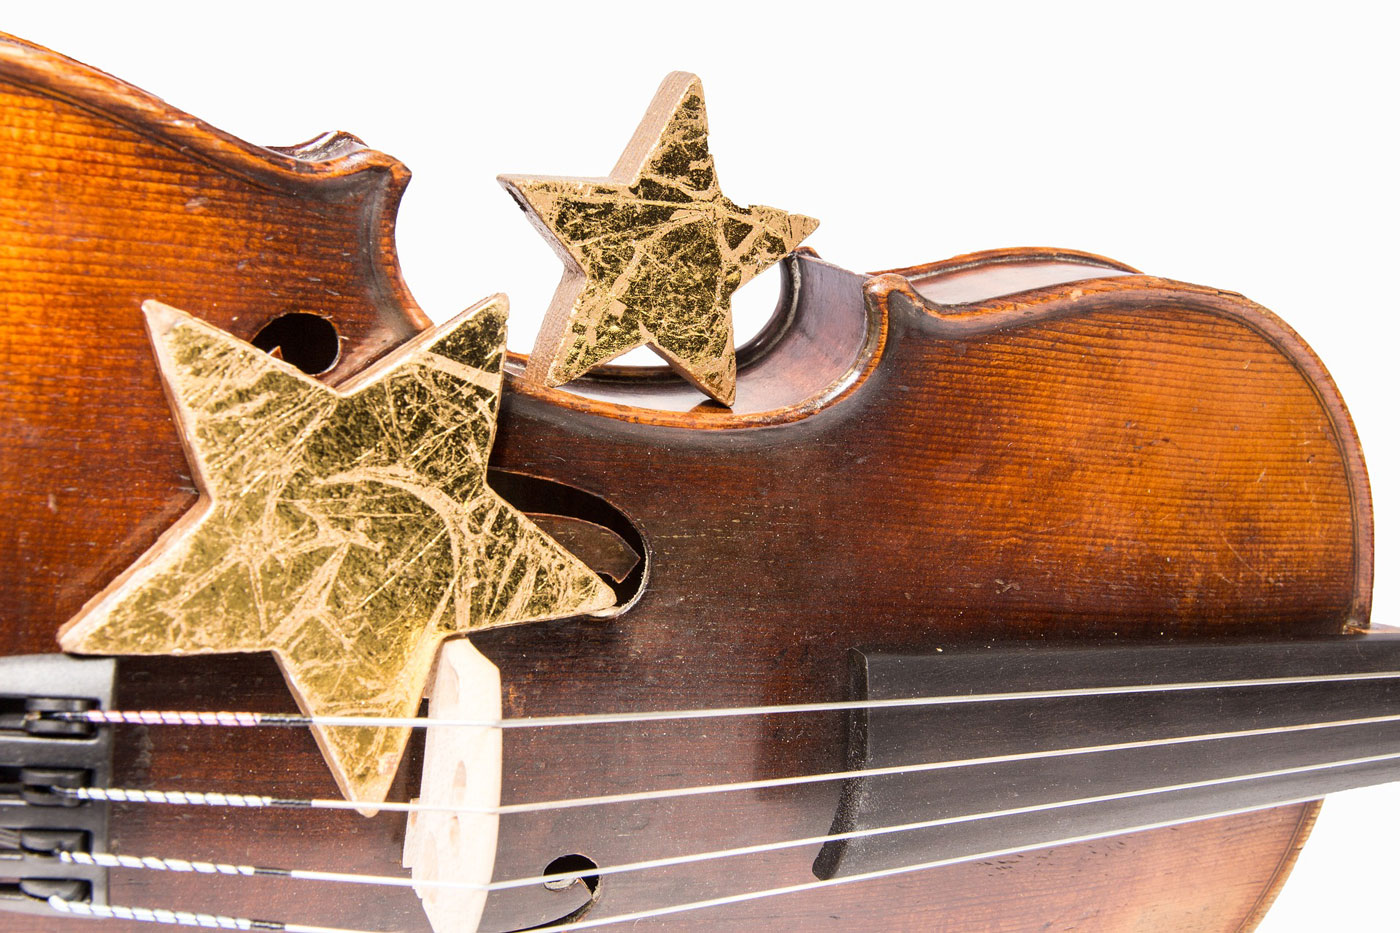 2018 12 20 Kerstgroet Voorzitter Symfonieorkest Bloembollenstreek